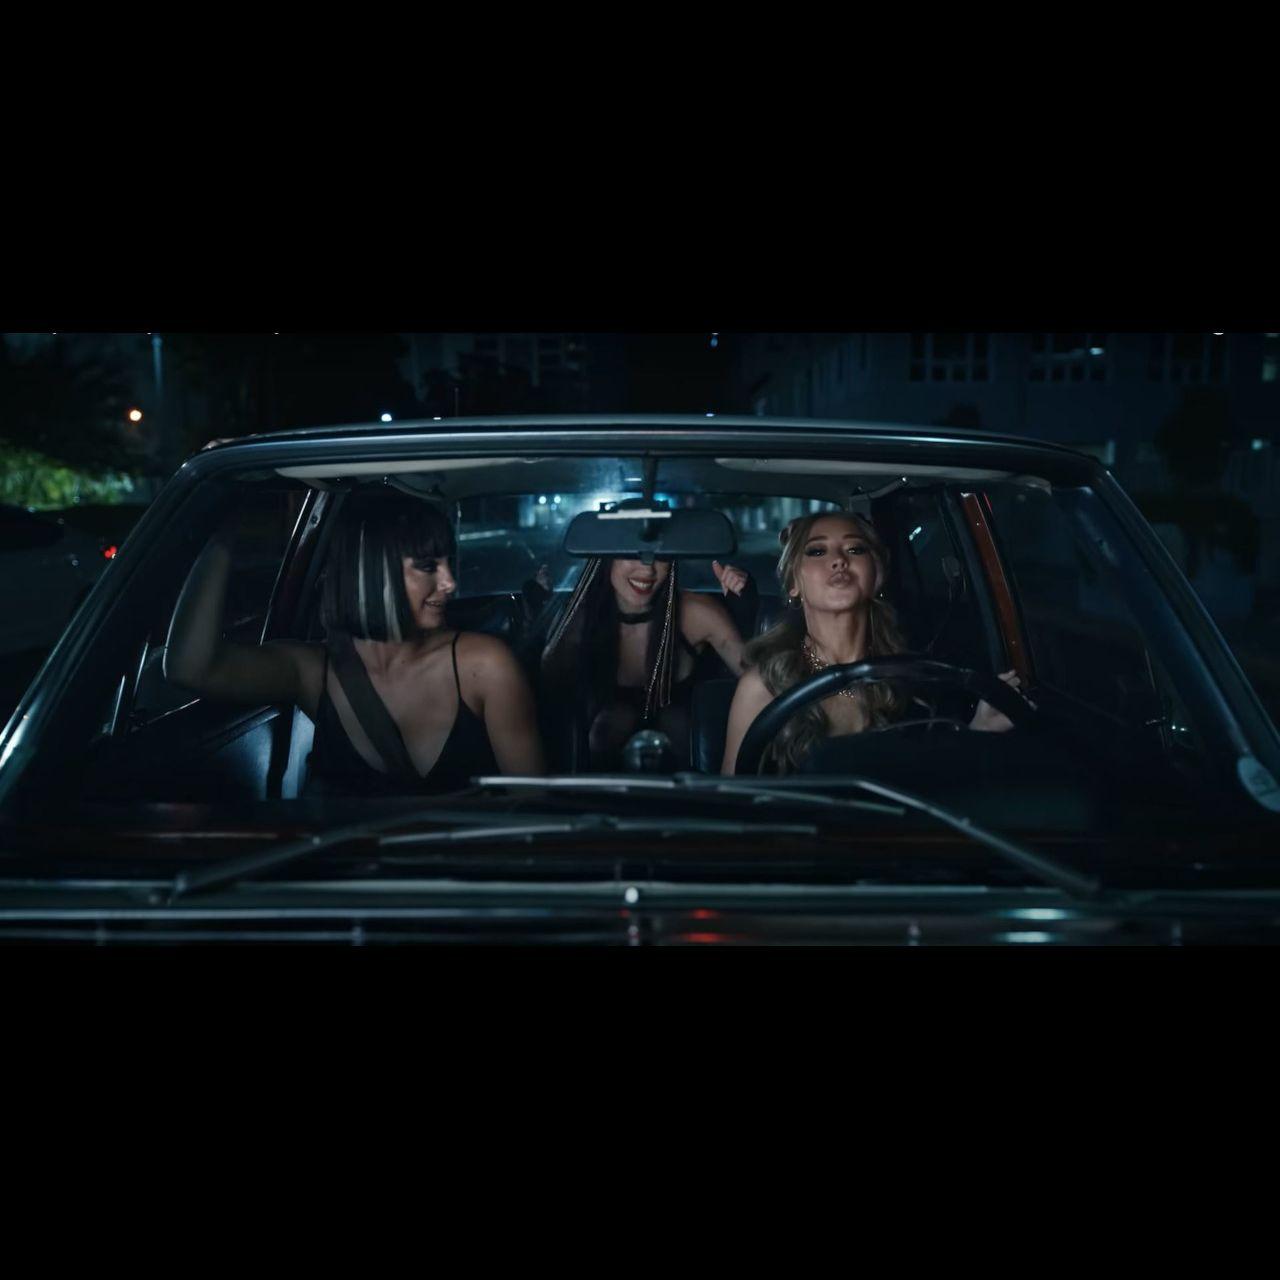 Daddy Yankee - Súbele el volumen (ft. Myke Towers and Jhay Cortez) (Thumbnail)